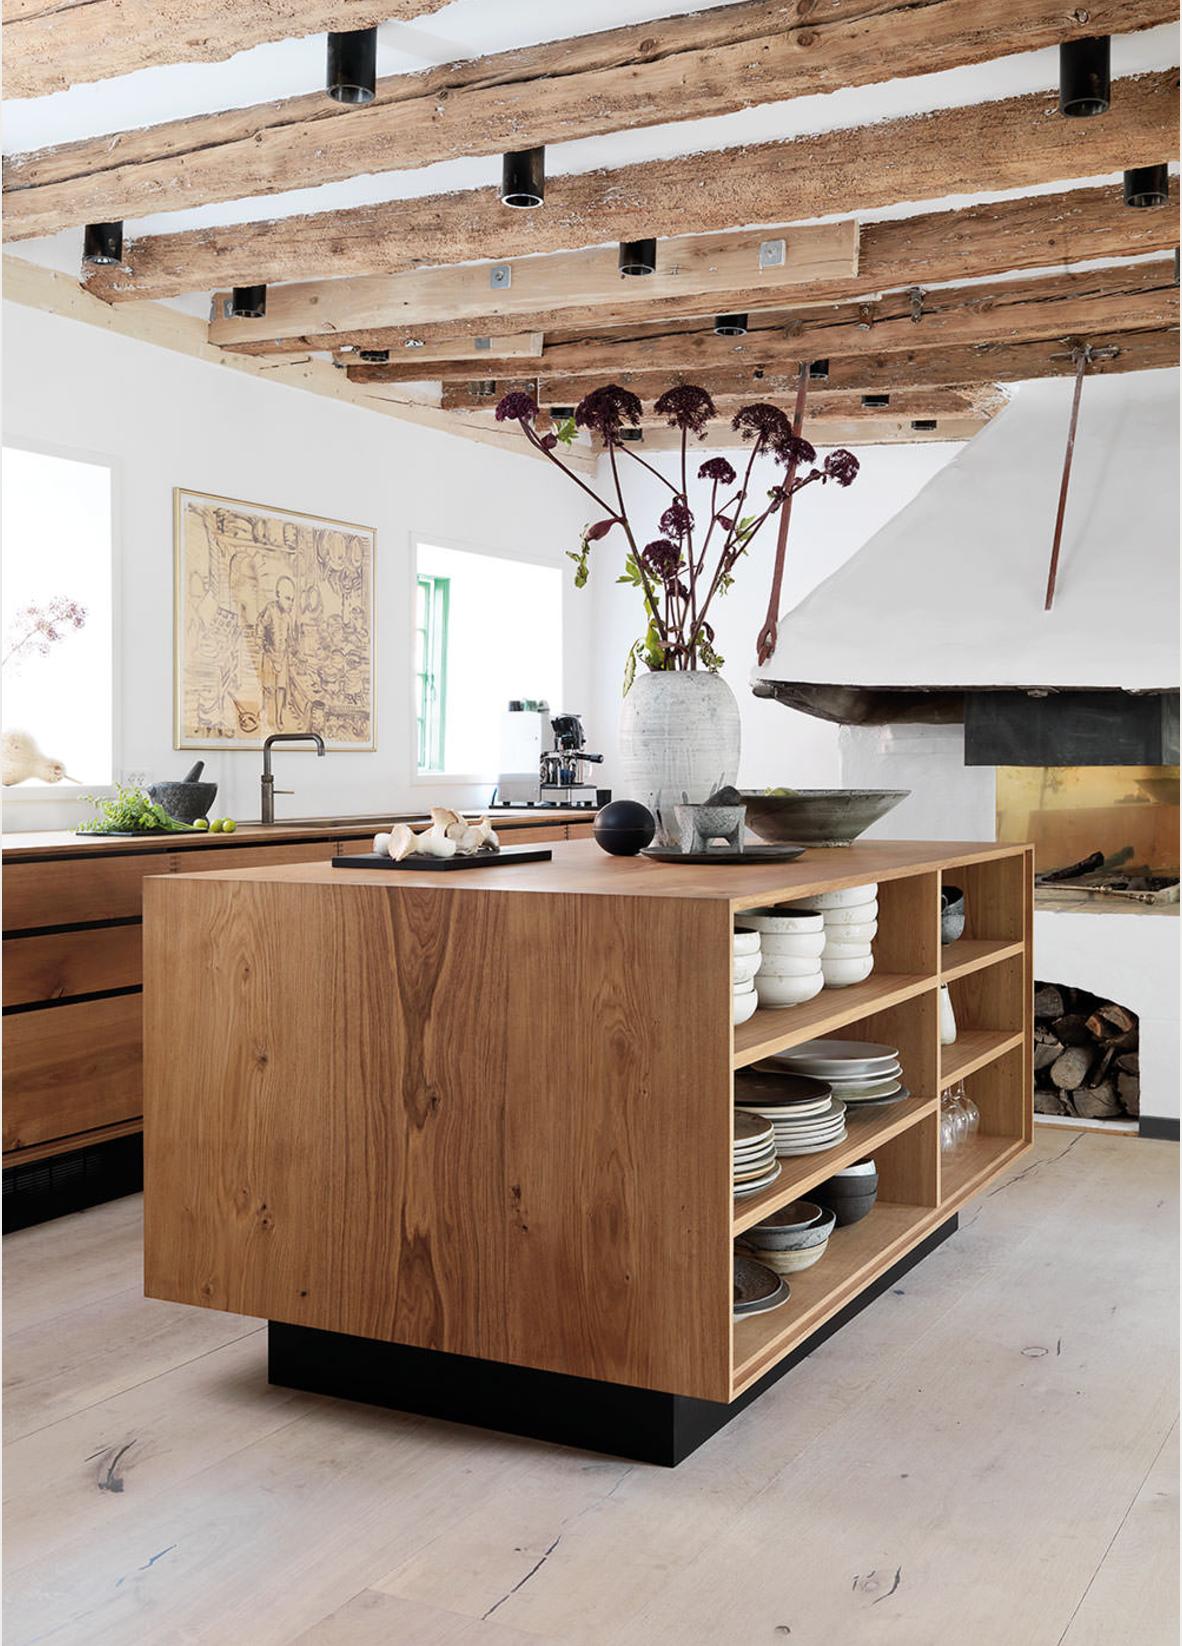 Pin de Avni Patel en Kitchens | Pinterest | Diseño de cocina, Madera ...